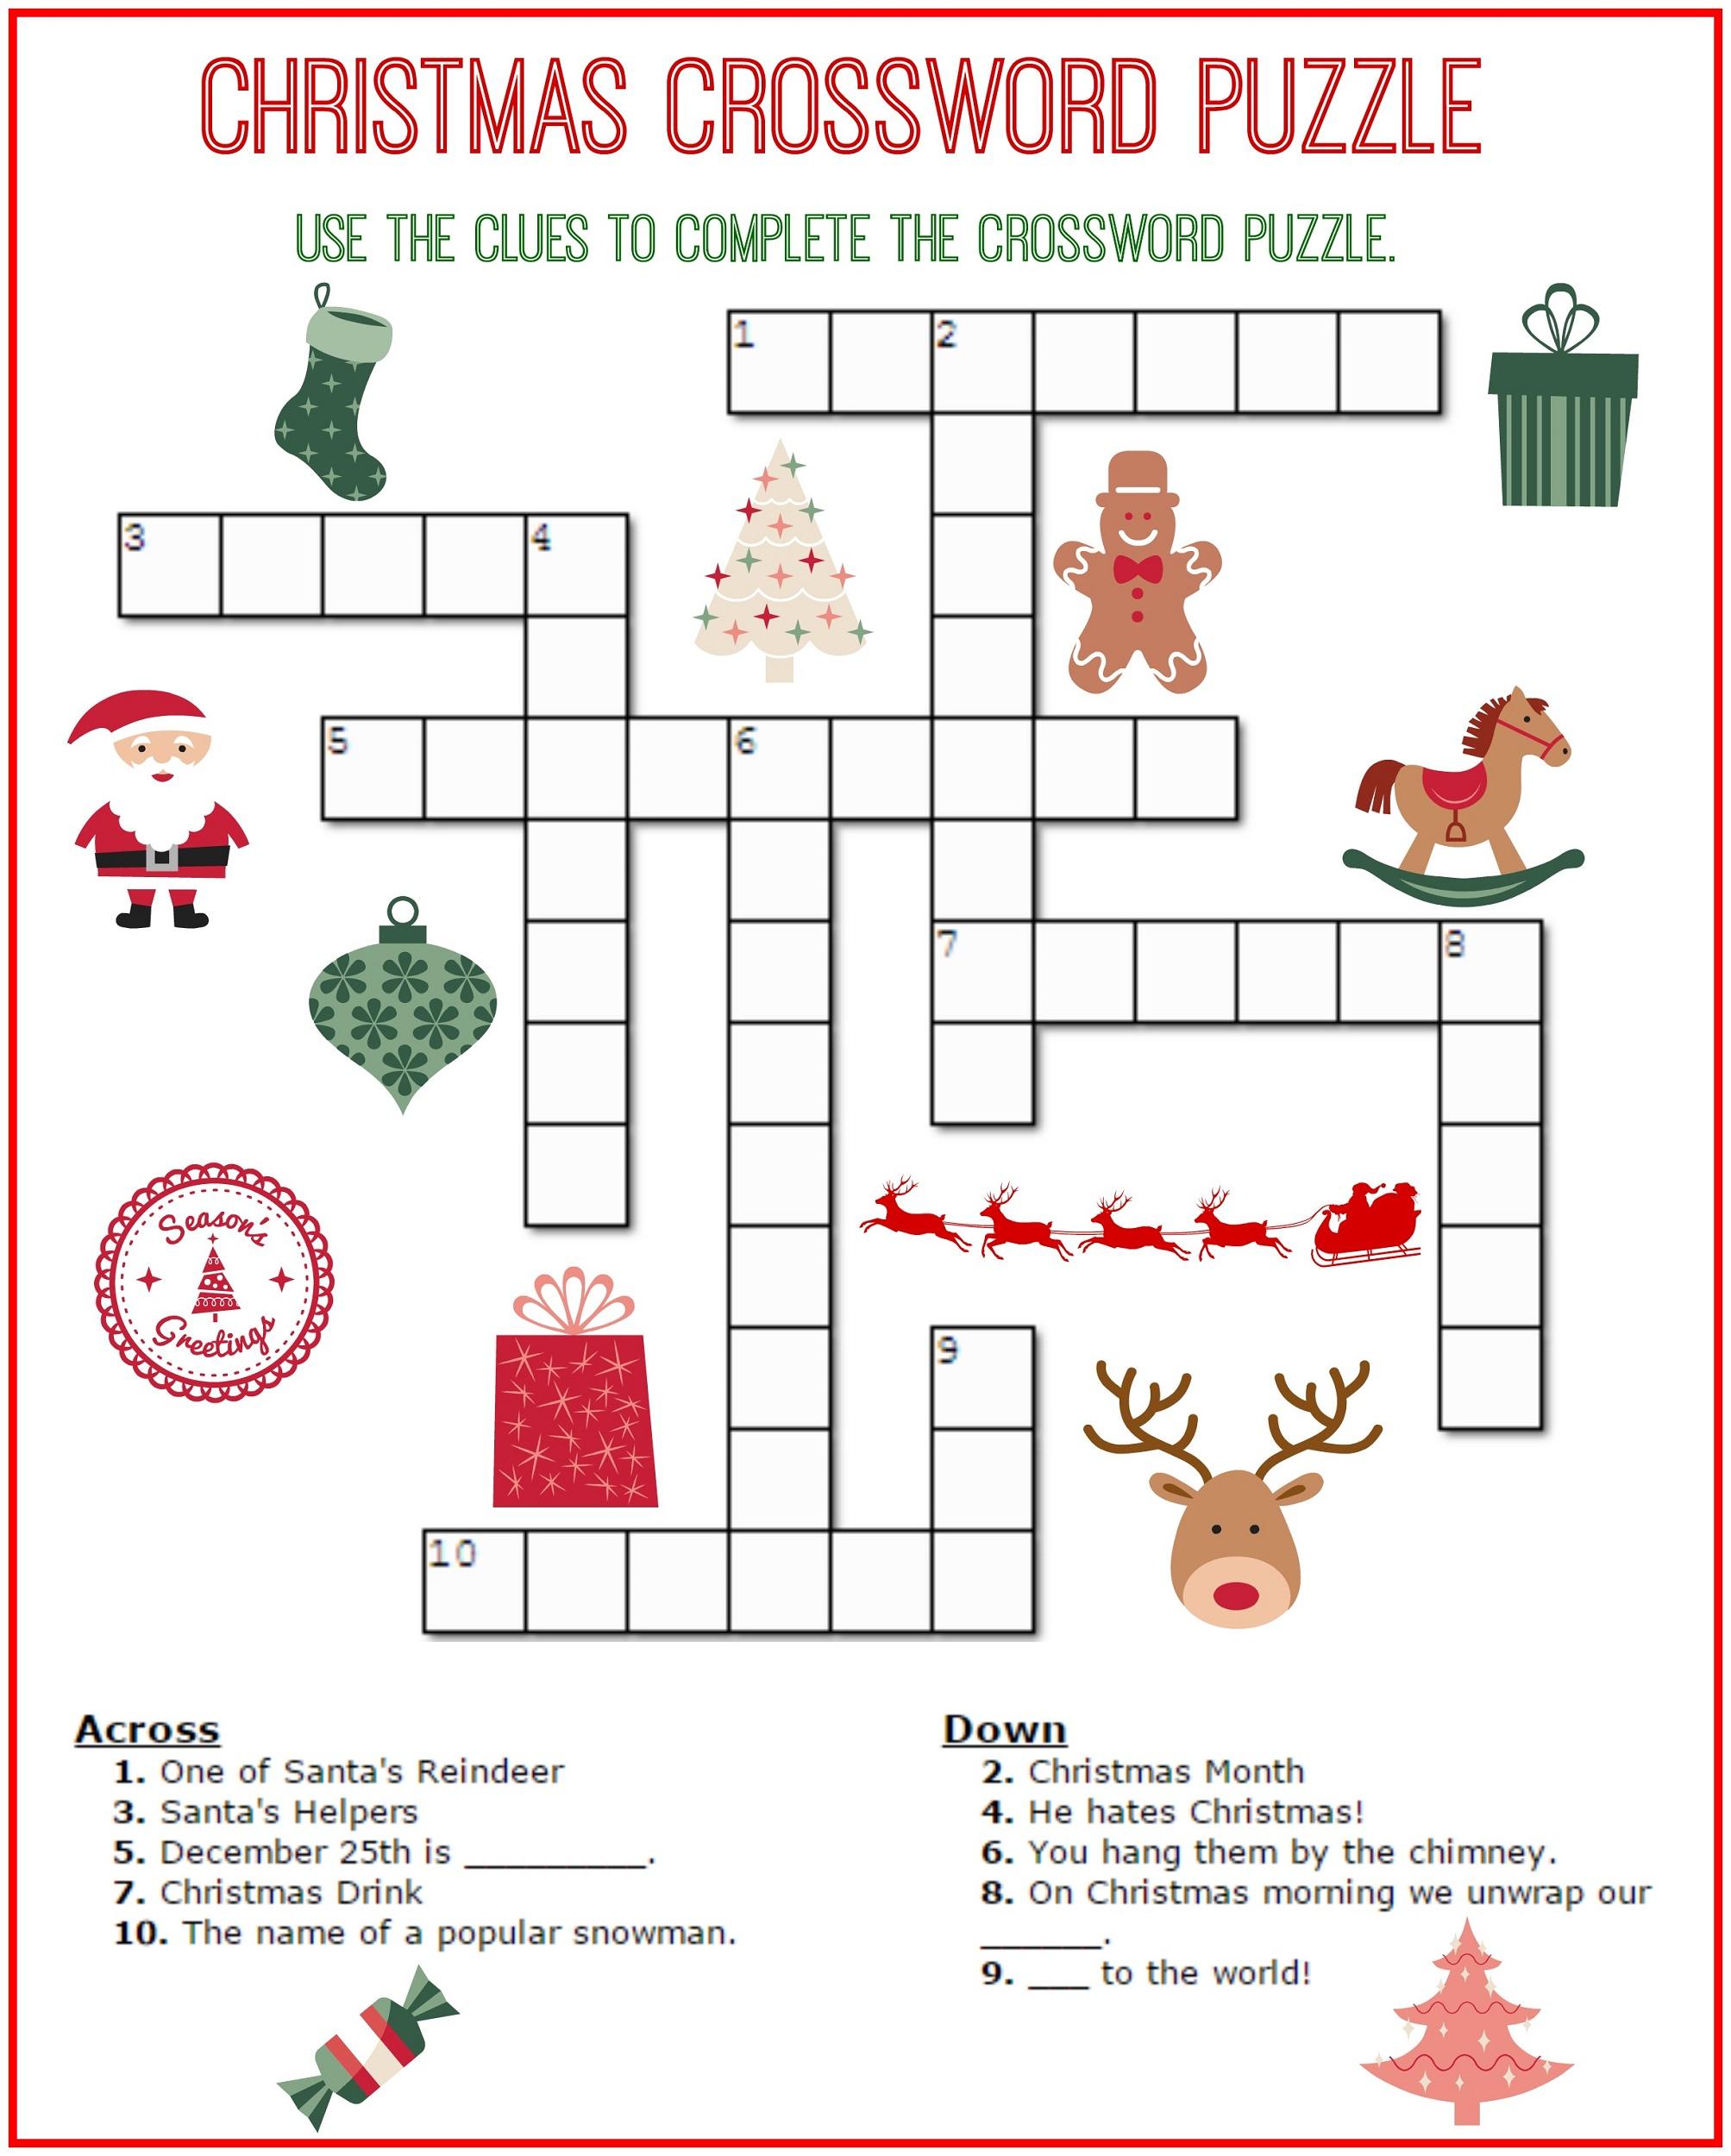 Childrens Crossword Puzzles Printable Crossword Puzzle Kids - Printable Junior Crossword Puzzles